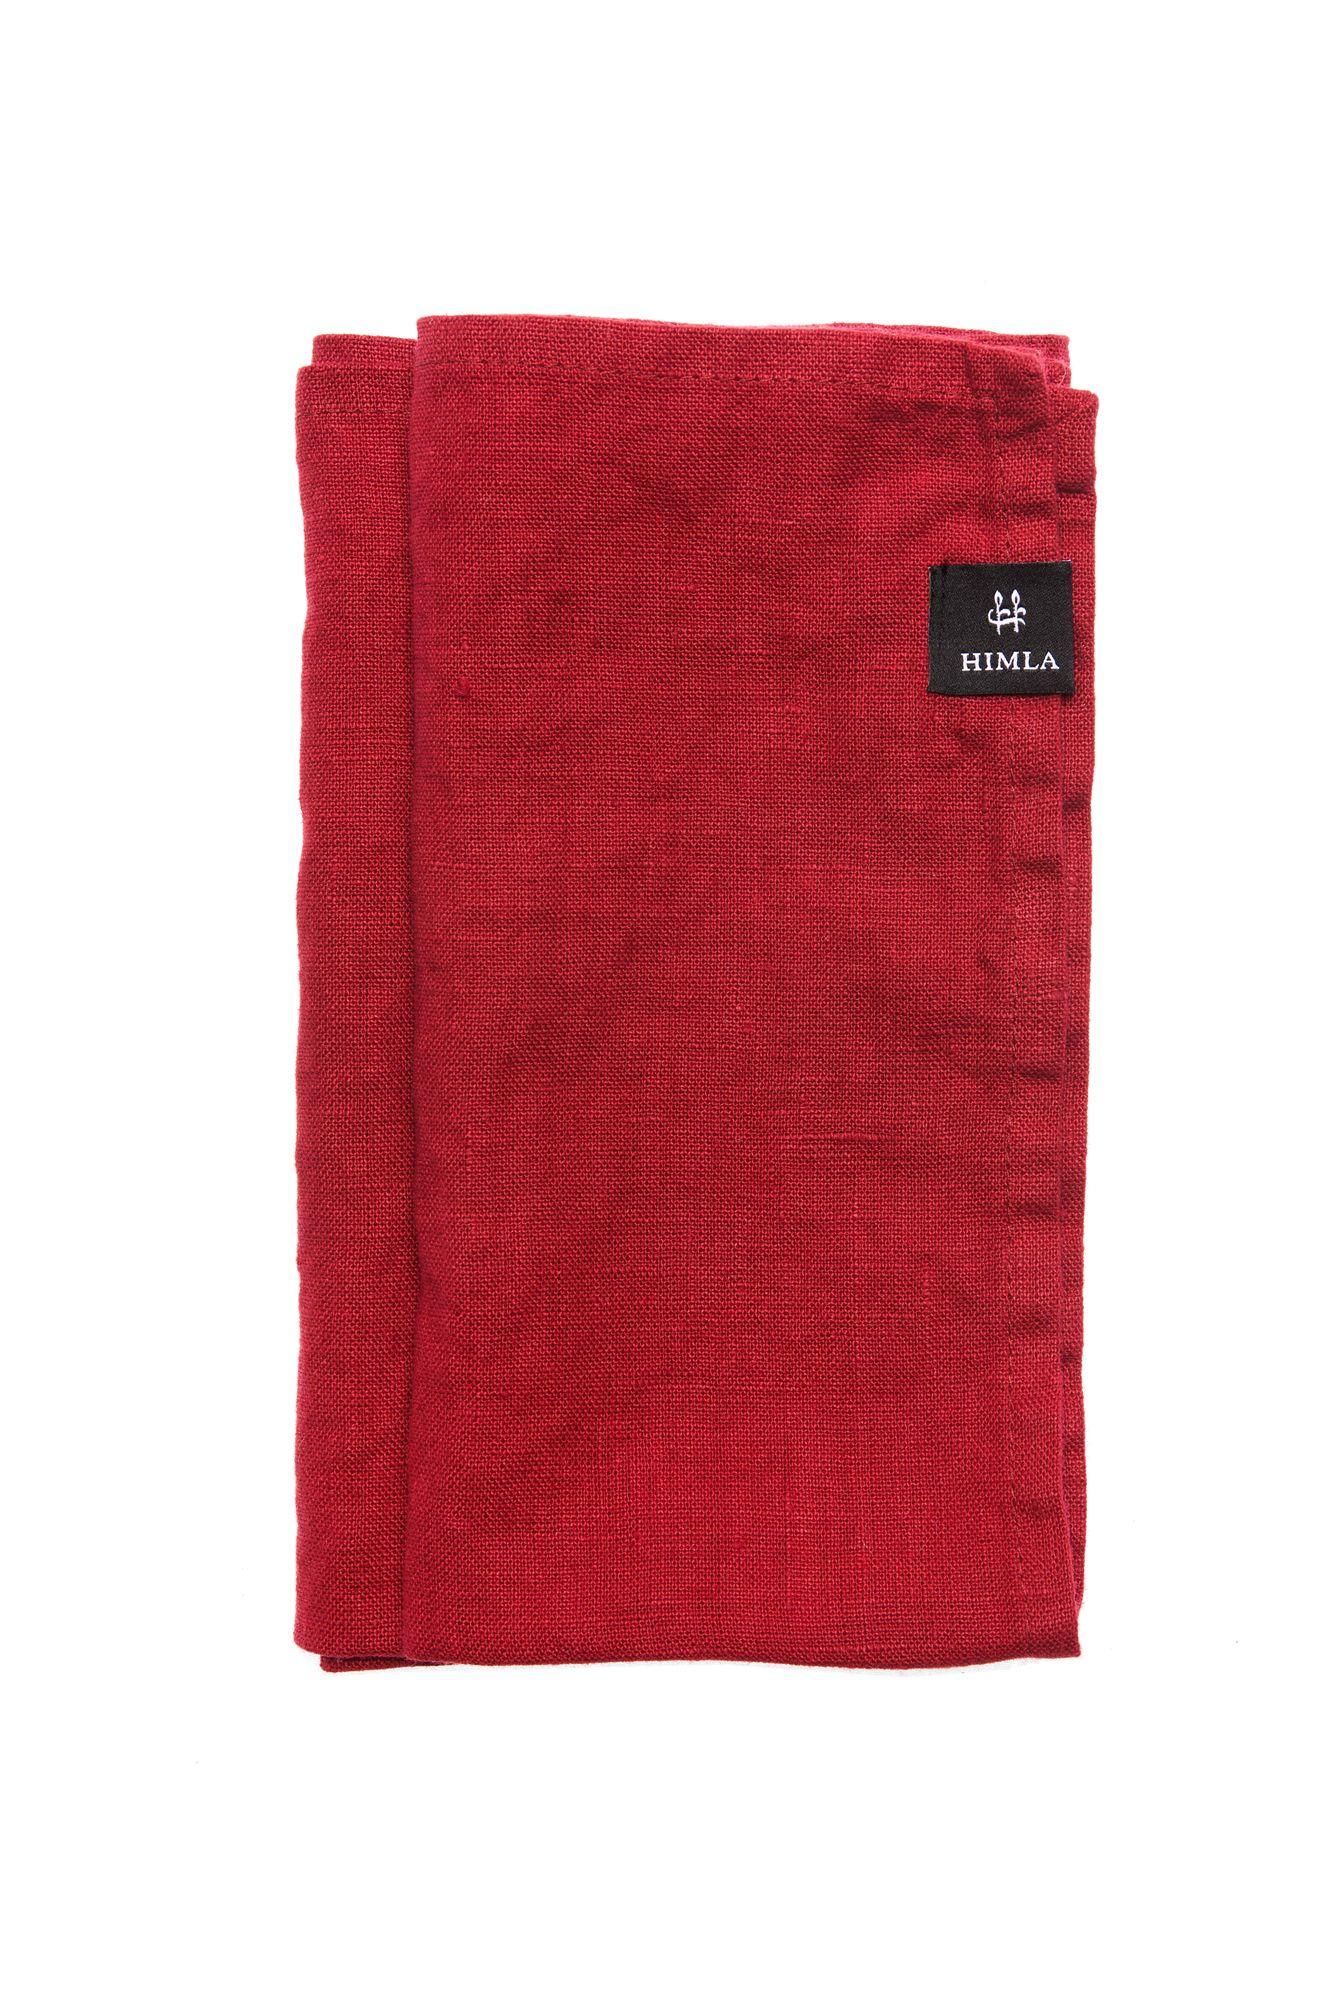 True Red Sunshine Linen Napkin 45x45cm (Set of 4)